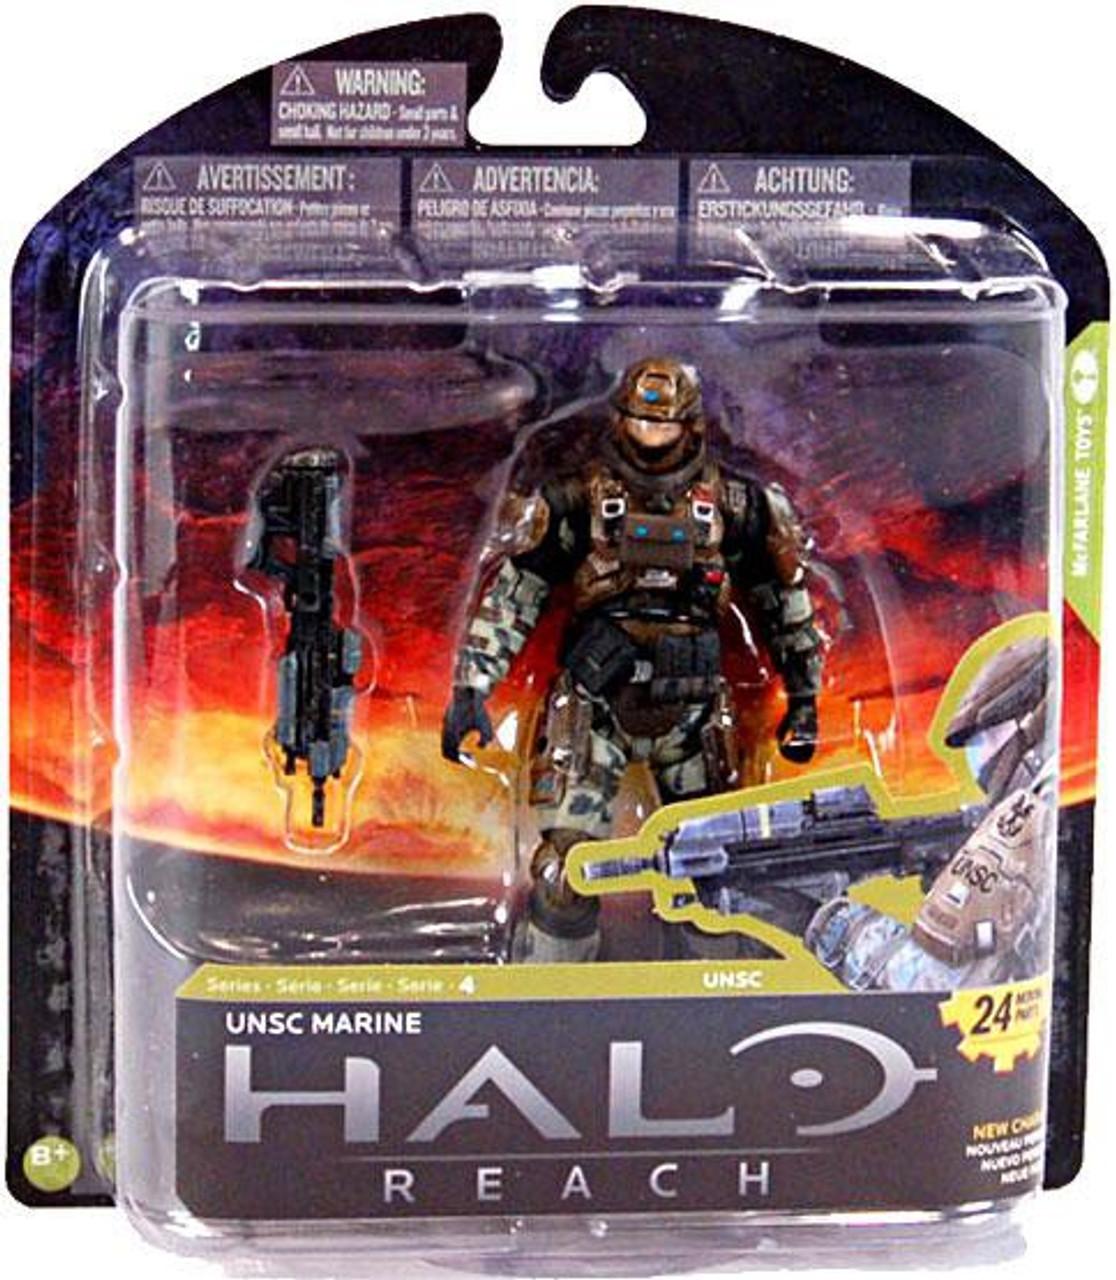 McFarlane Toys Halo Reach Series 4 UNSC Marine Action Figure